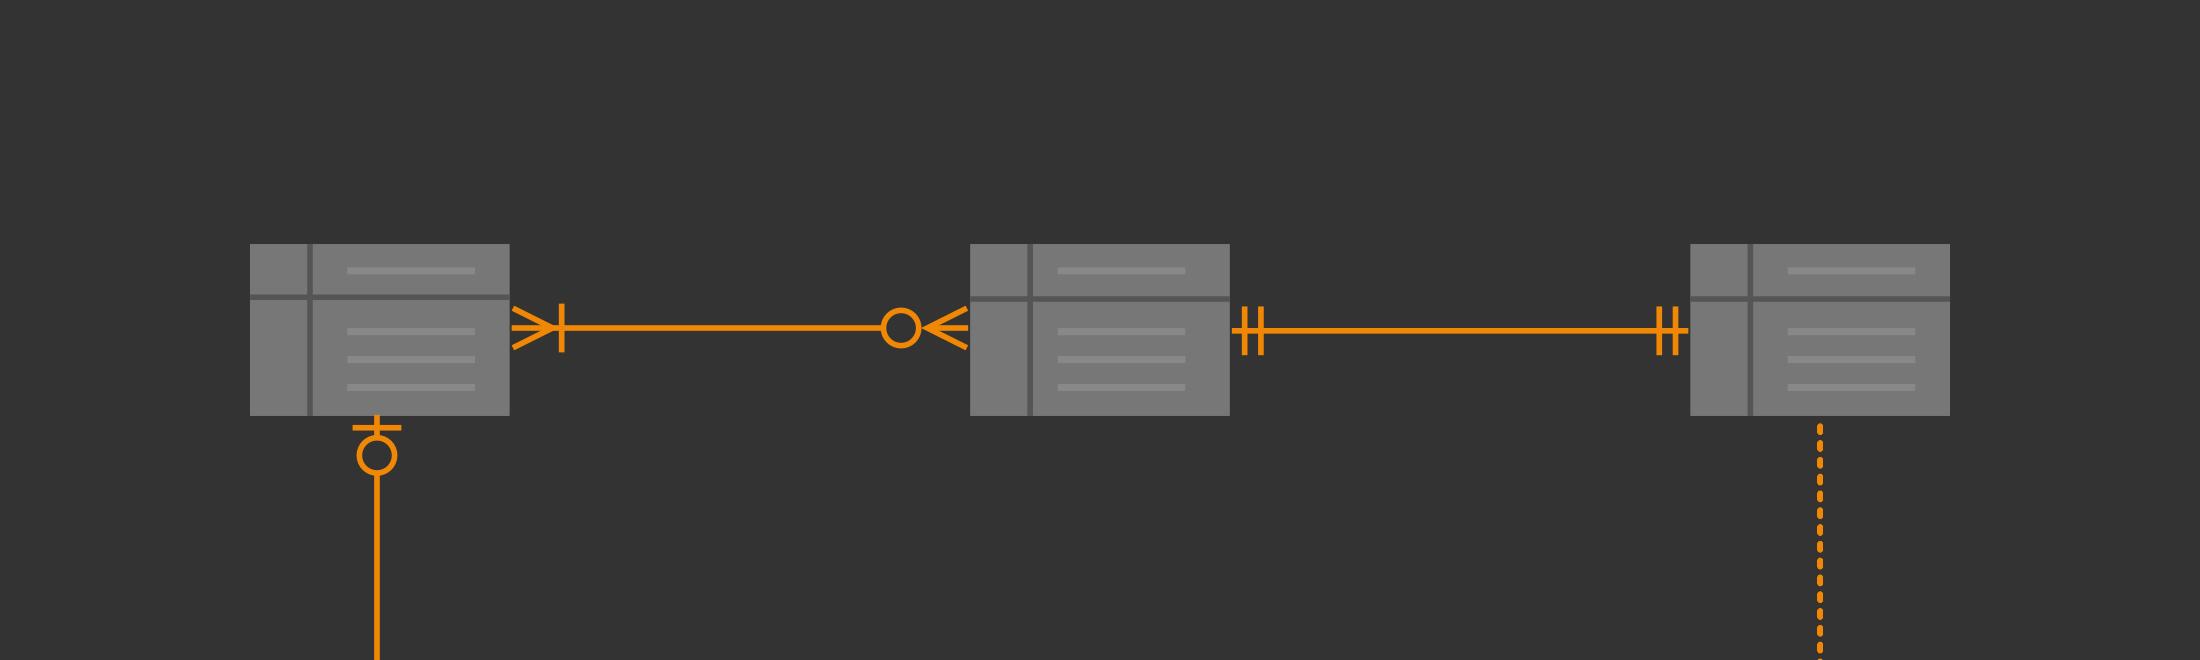 Entity Relationship Diagrams With Draw.io – Draw.io inside Er Diagram Draw.io